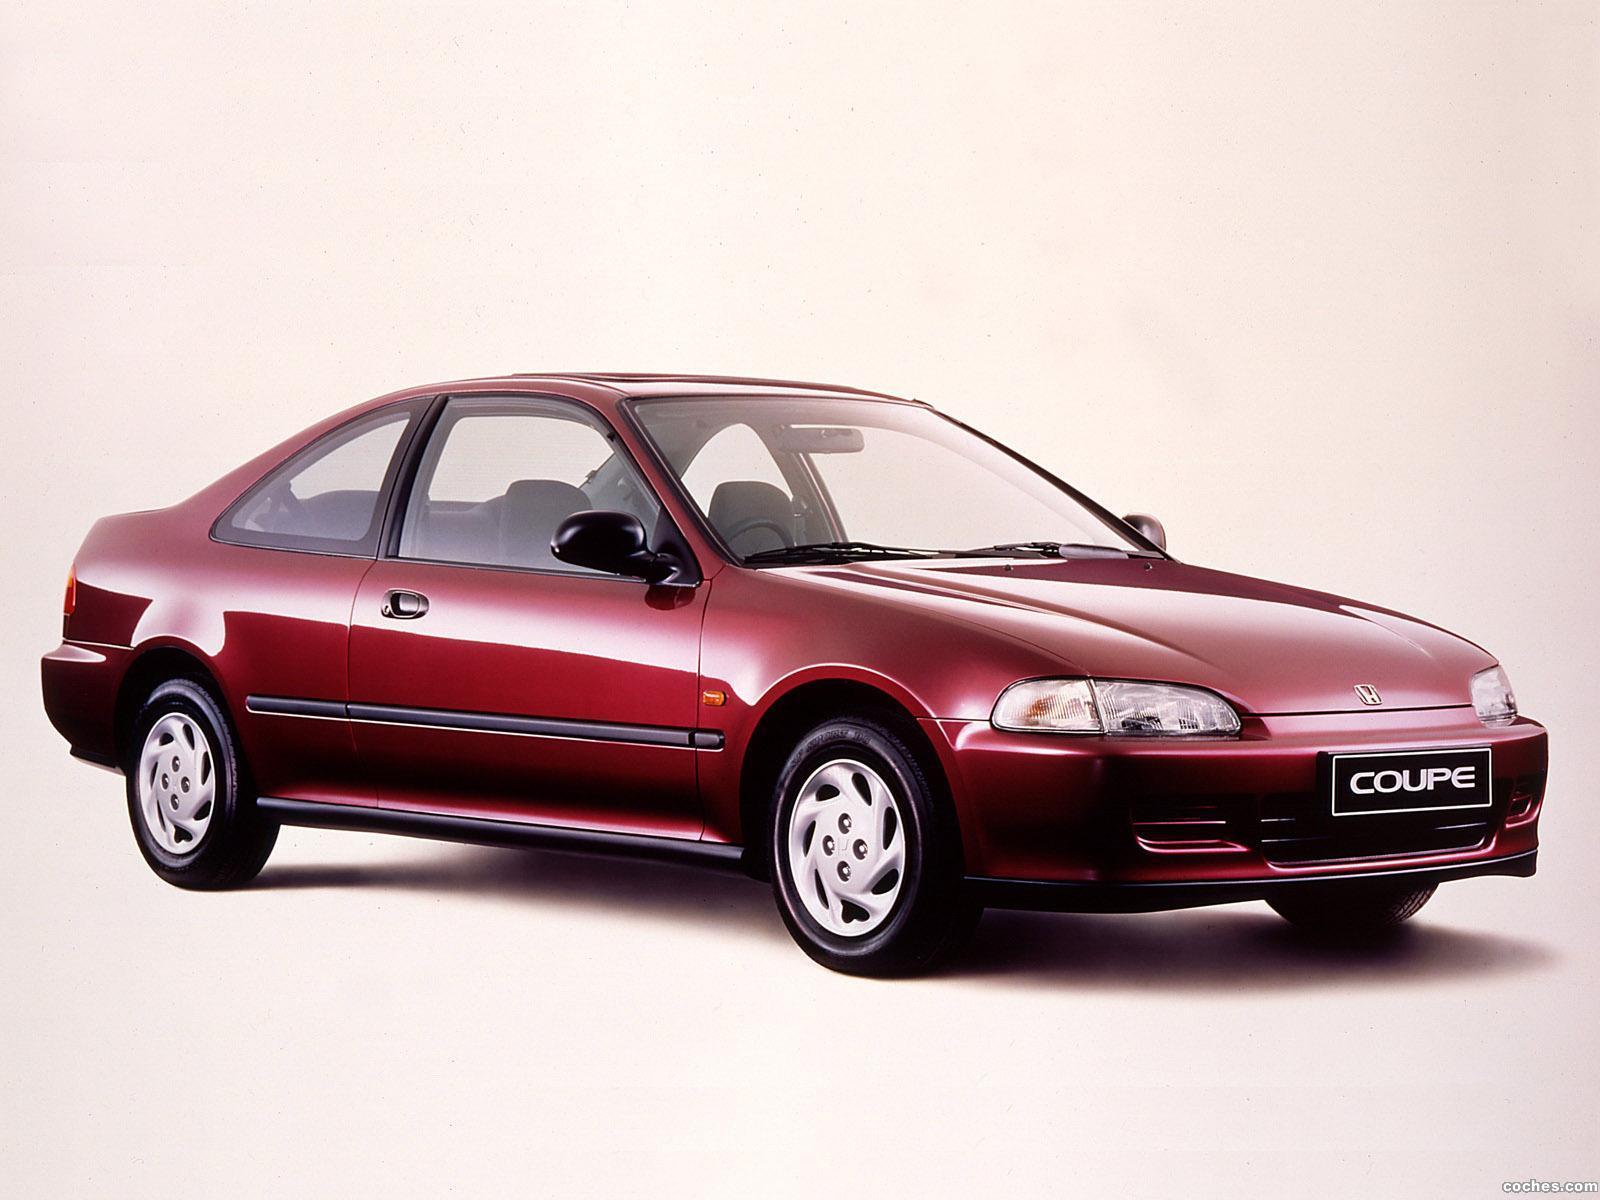 Fotos de Honda Civic Coupe 1993